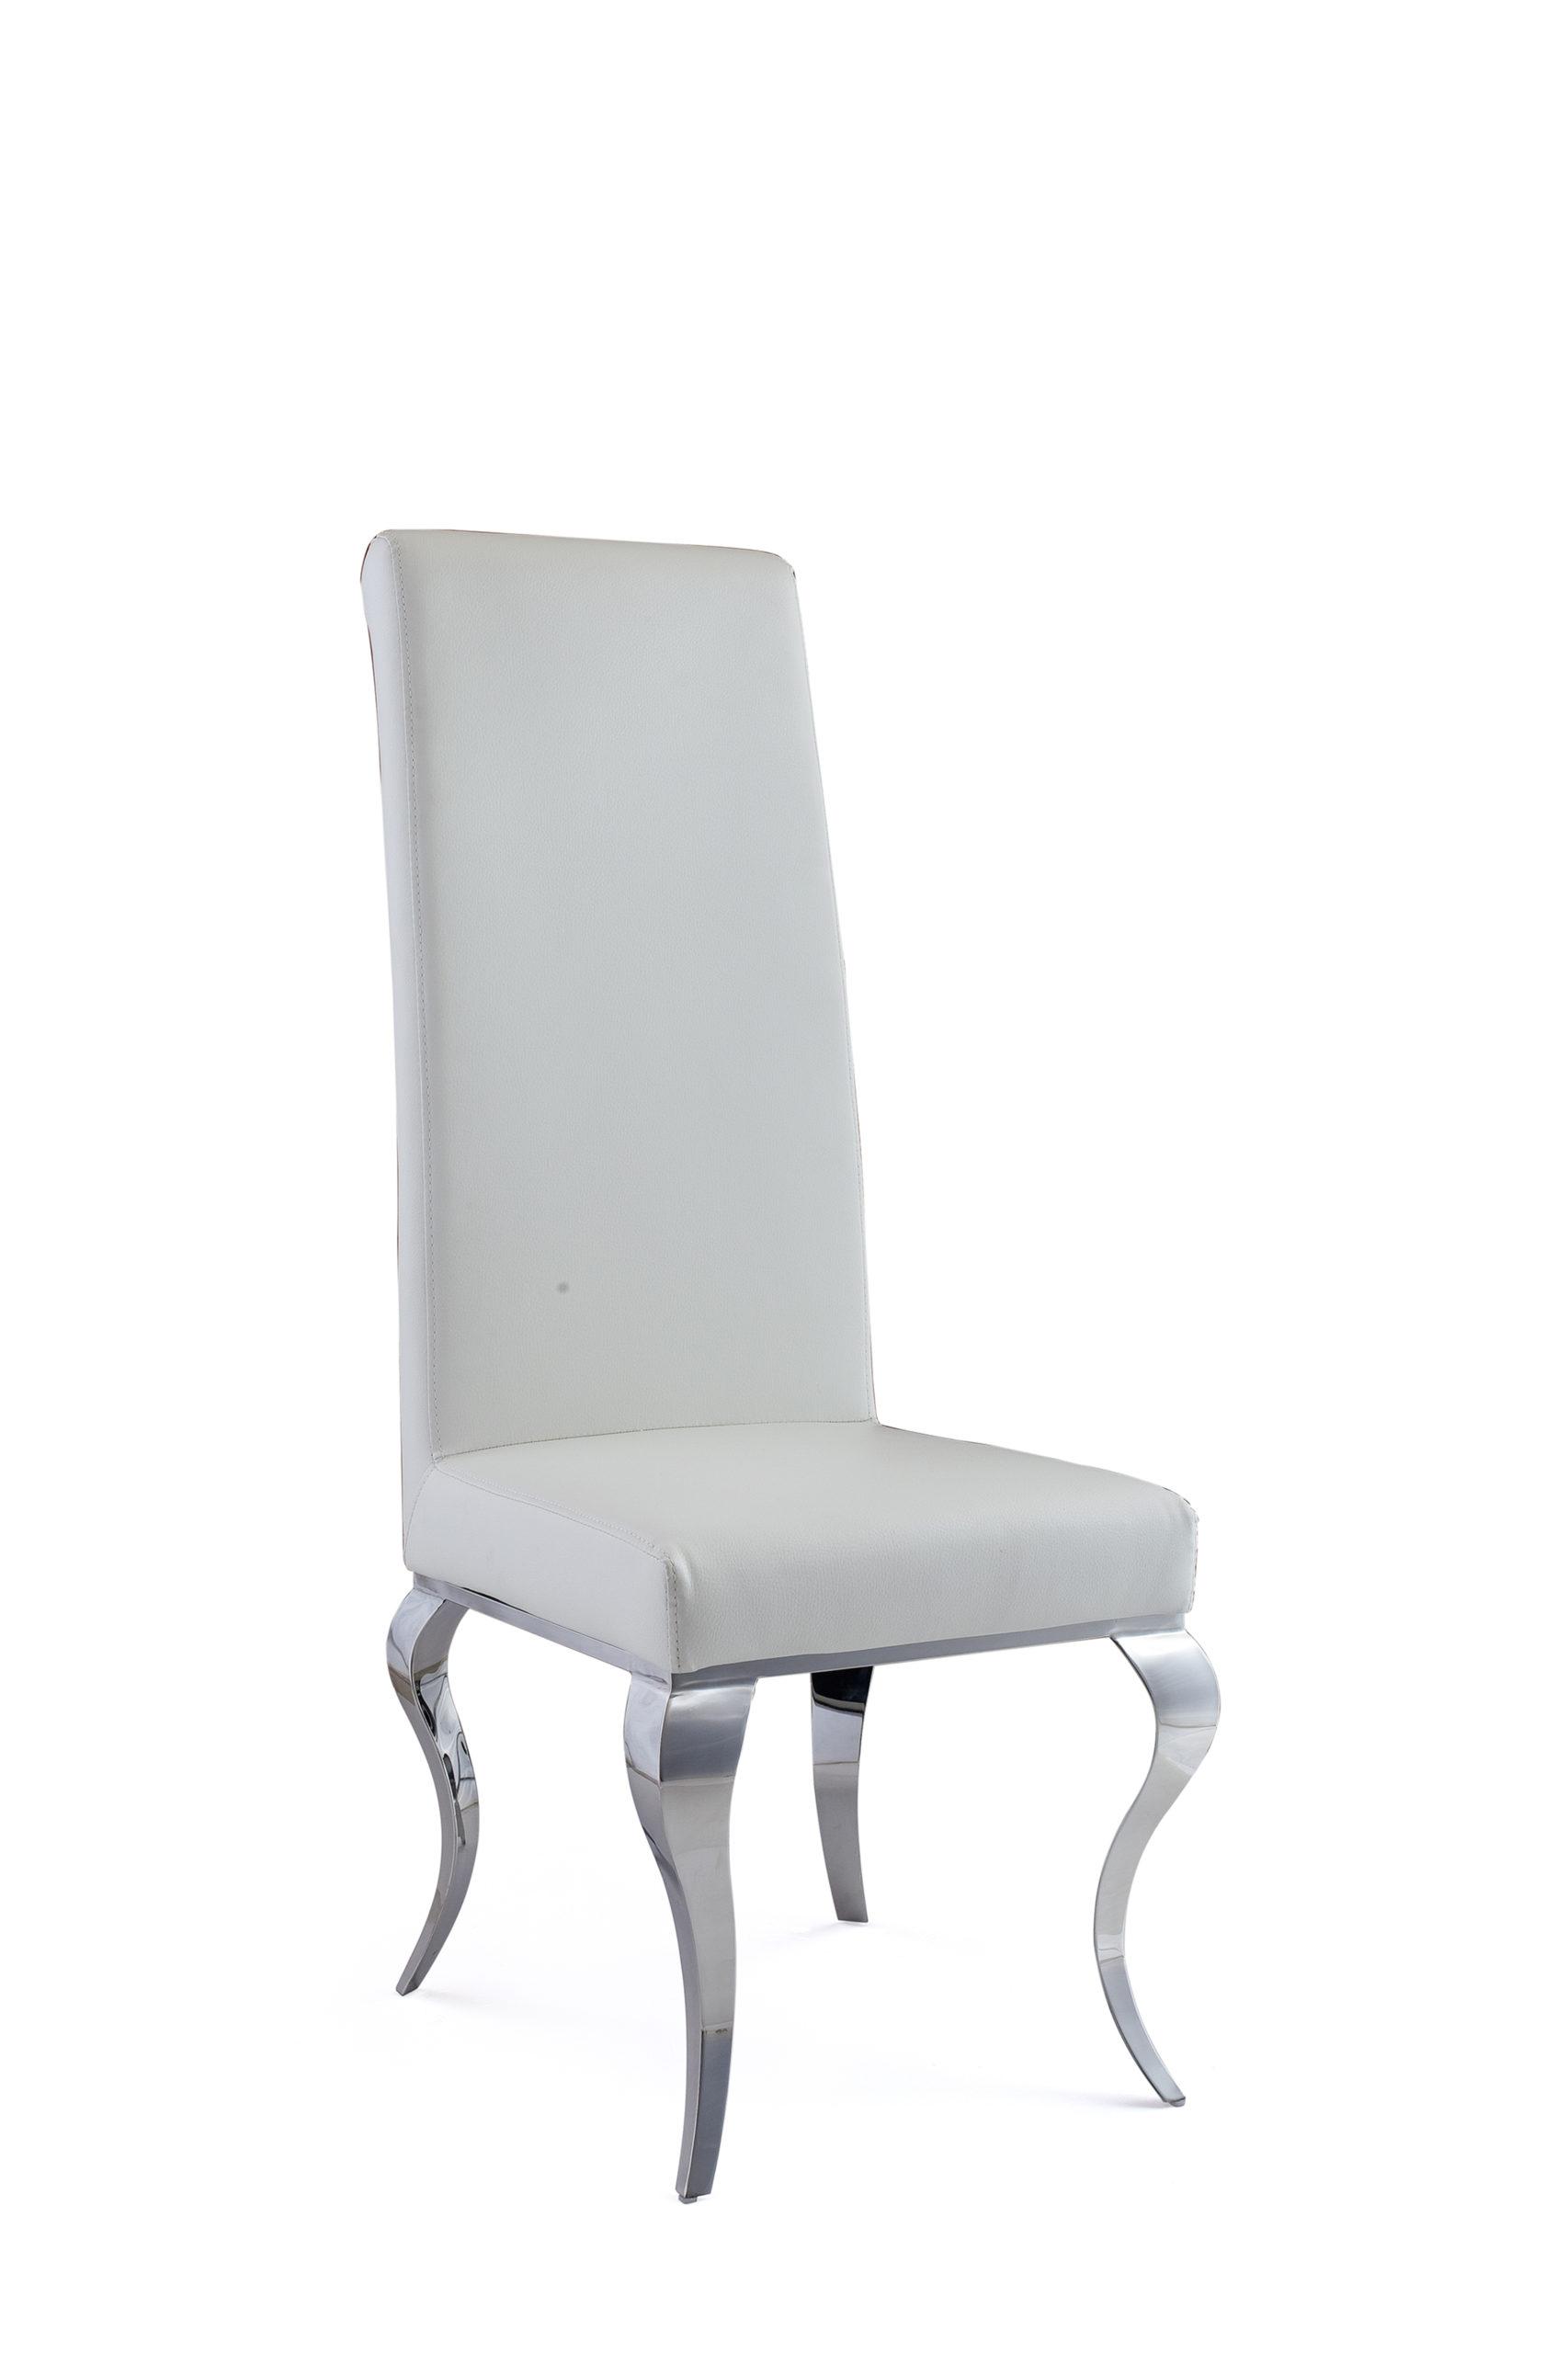 "Stuhl ""Christie"", Art.-Nr.: Y3022H, Maße ca. in cm: 48 B x 55  T x 120 H"